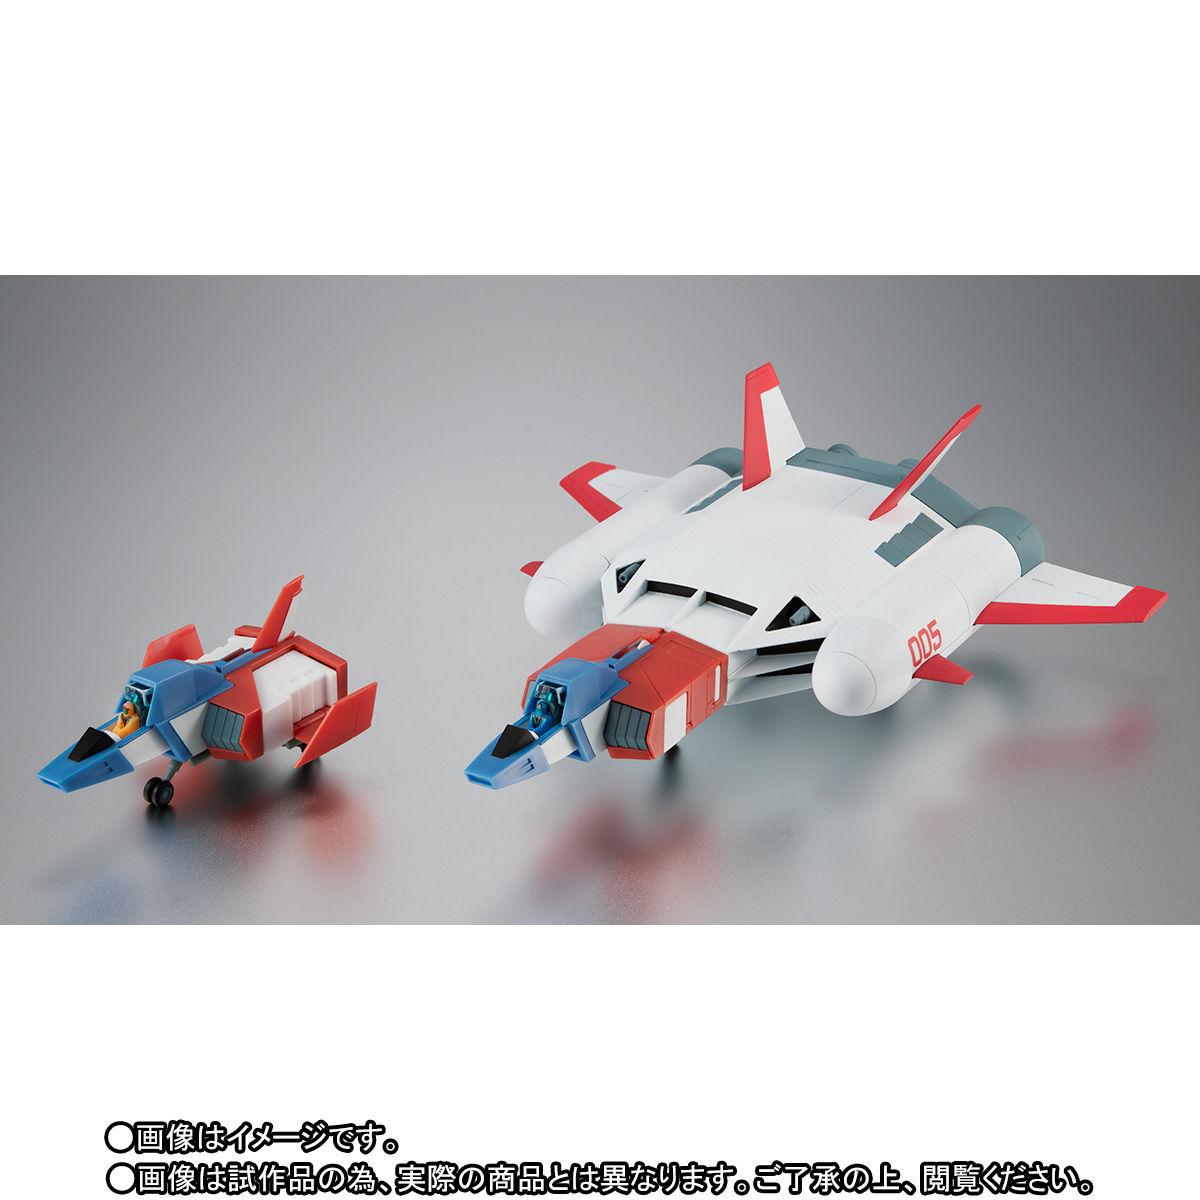 ROBOT魂〈SIDE MS〉『FF-X7-Bst コア・ブースター 2機セット ver. A.N.I.M.E. ~スレッガー005 & セイラ006~』機動戦士ガンダム 可動フィギュア-005